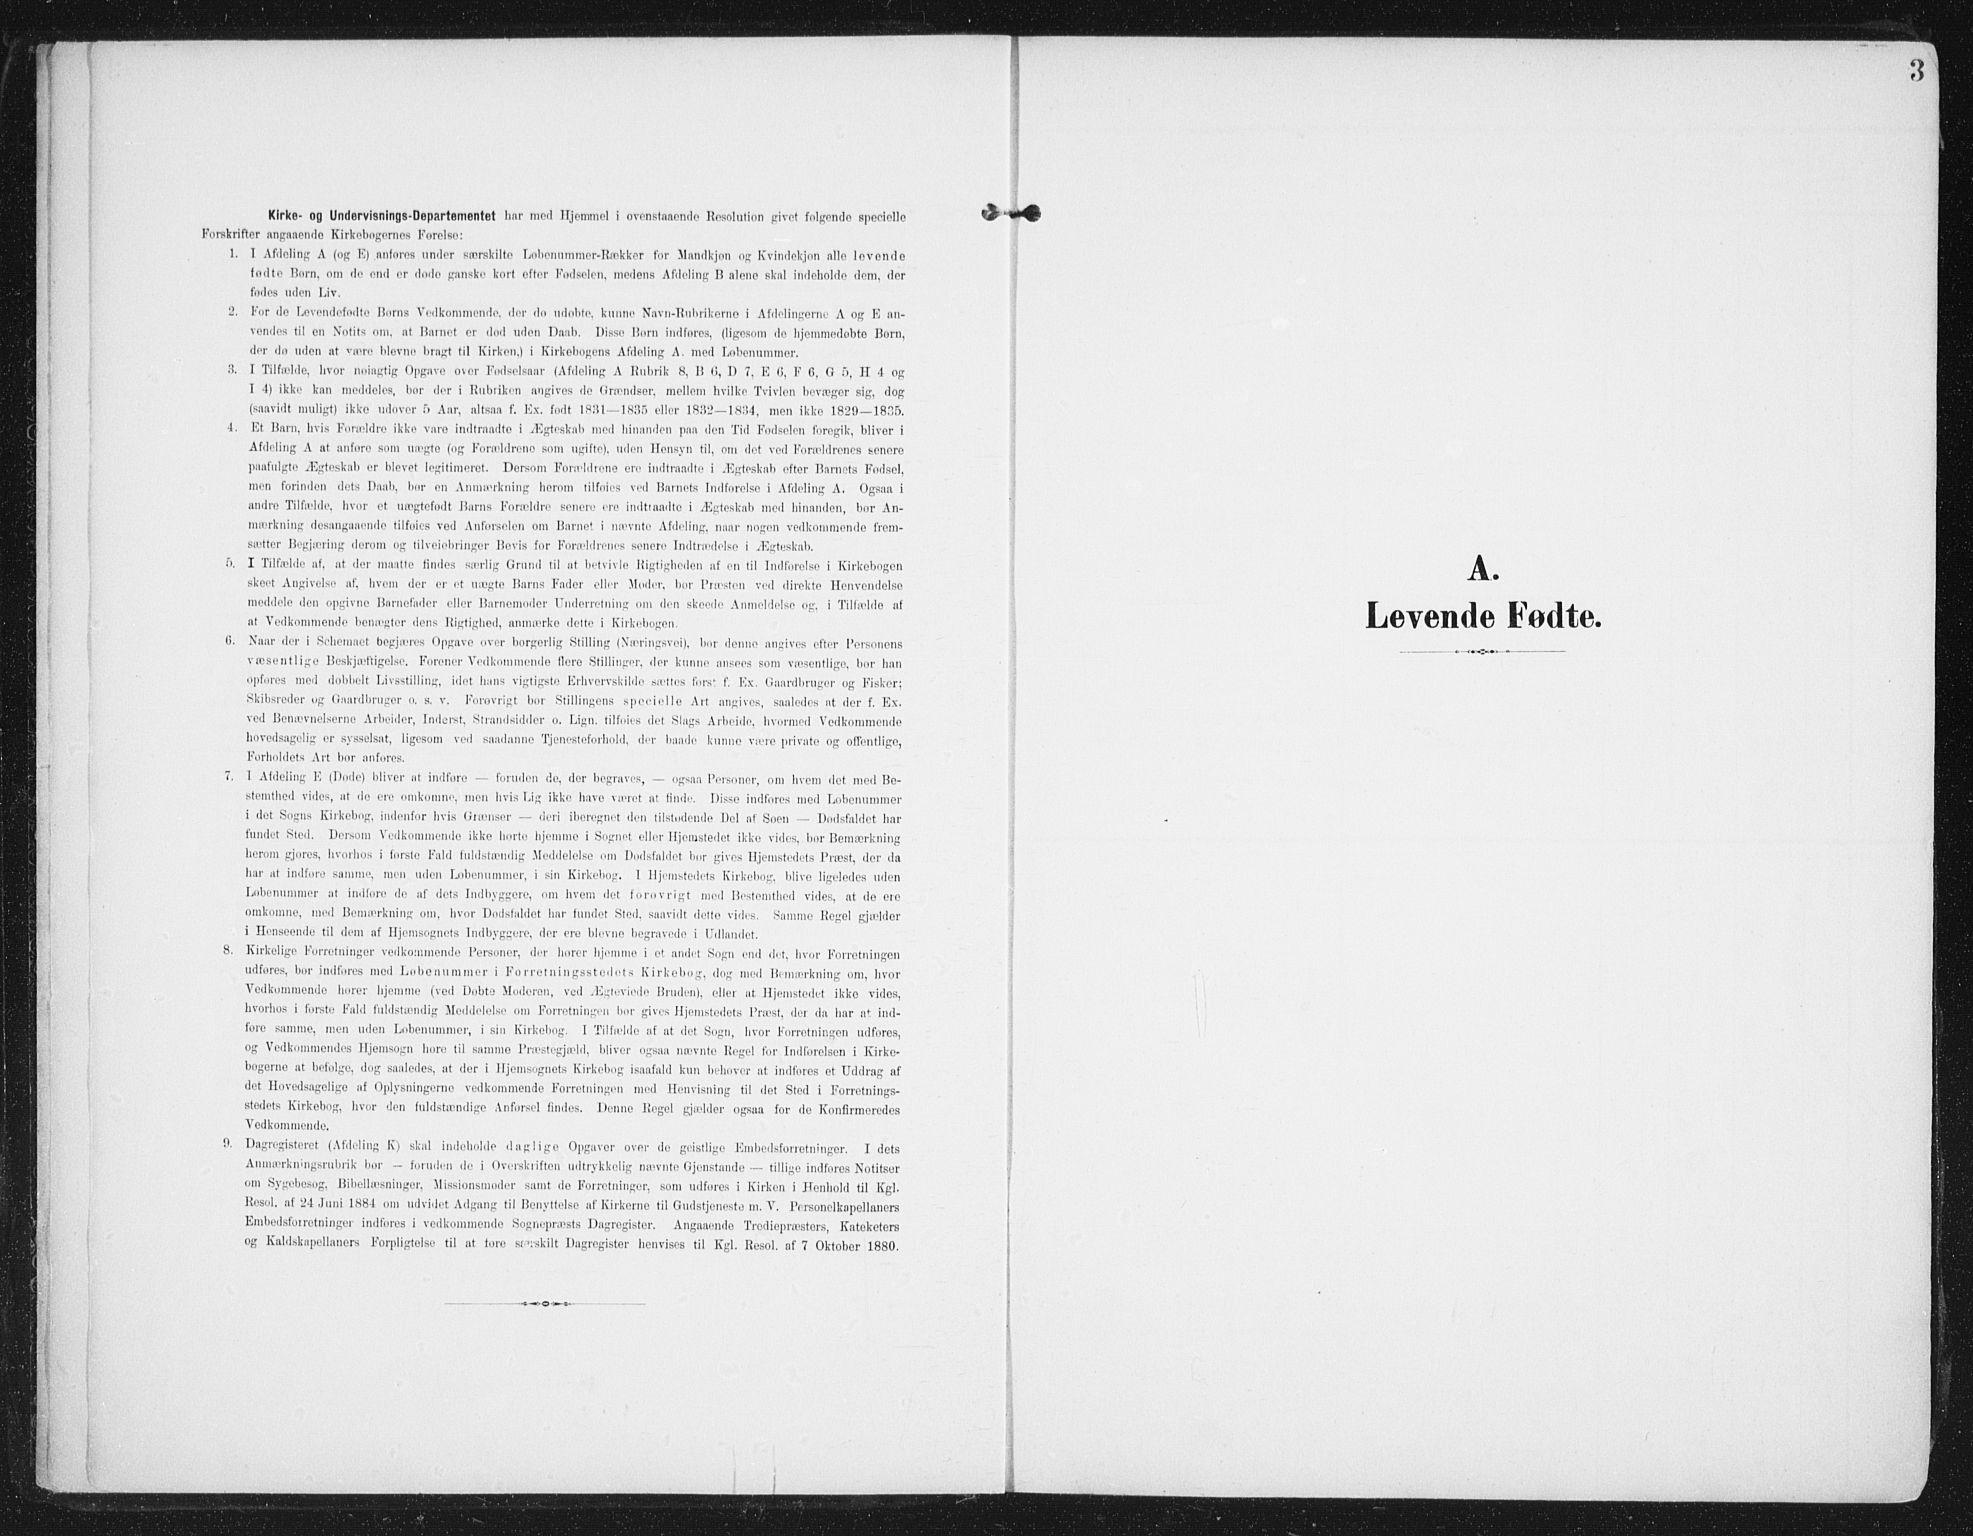 SAT, Ministerialprotokoller, klokkerbøker og fødselsregistre - Nordland, 892/L1321: Ministerialbok nr. 892A02, 1902-1918, s. 3